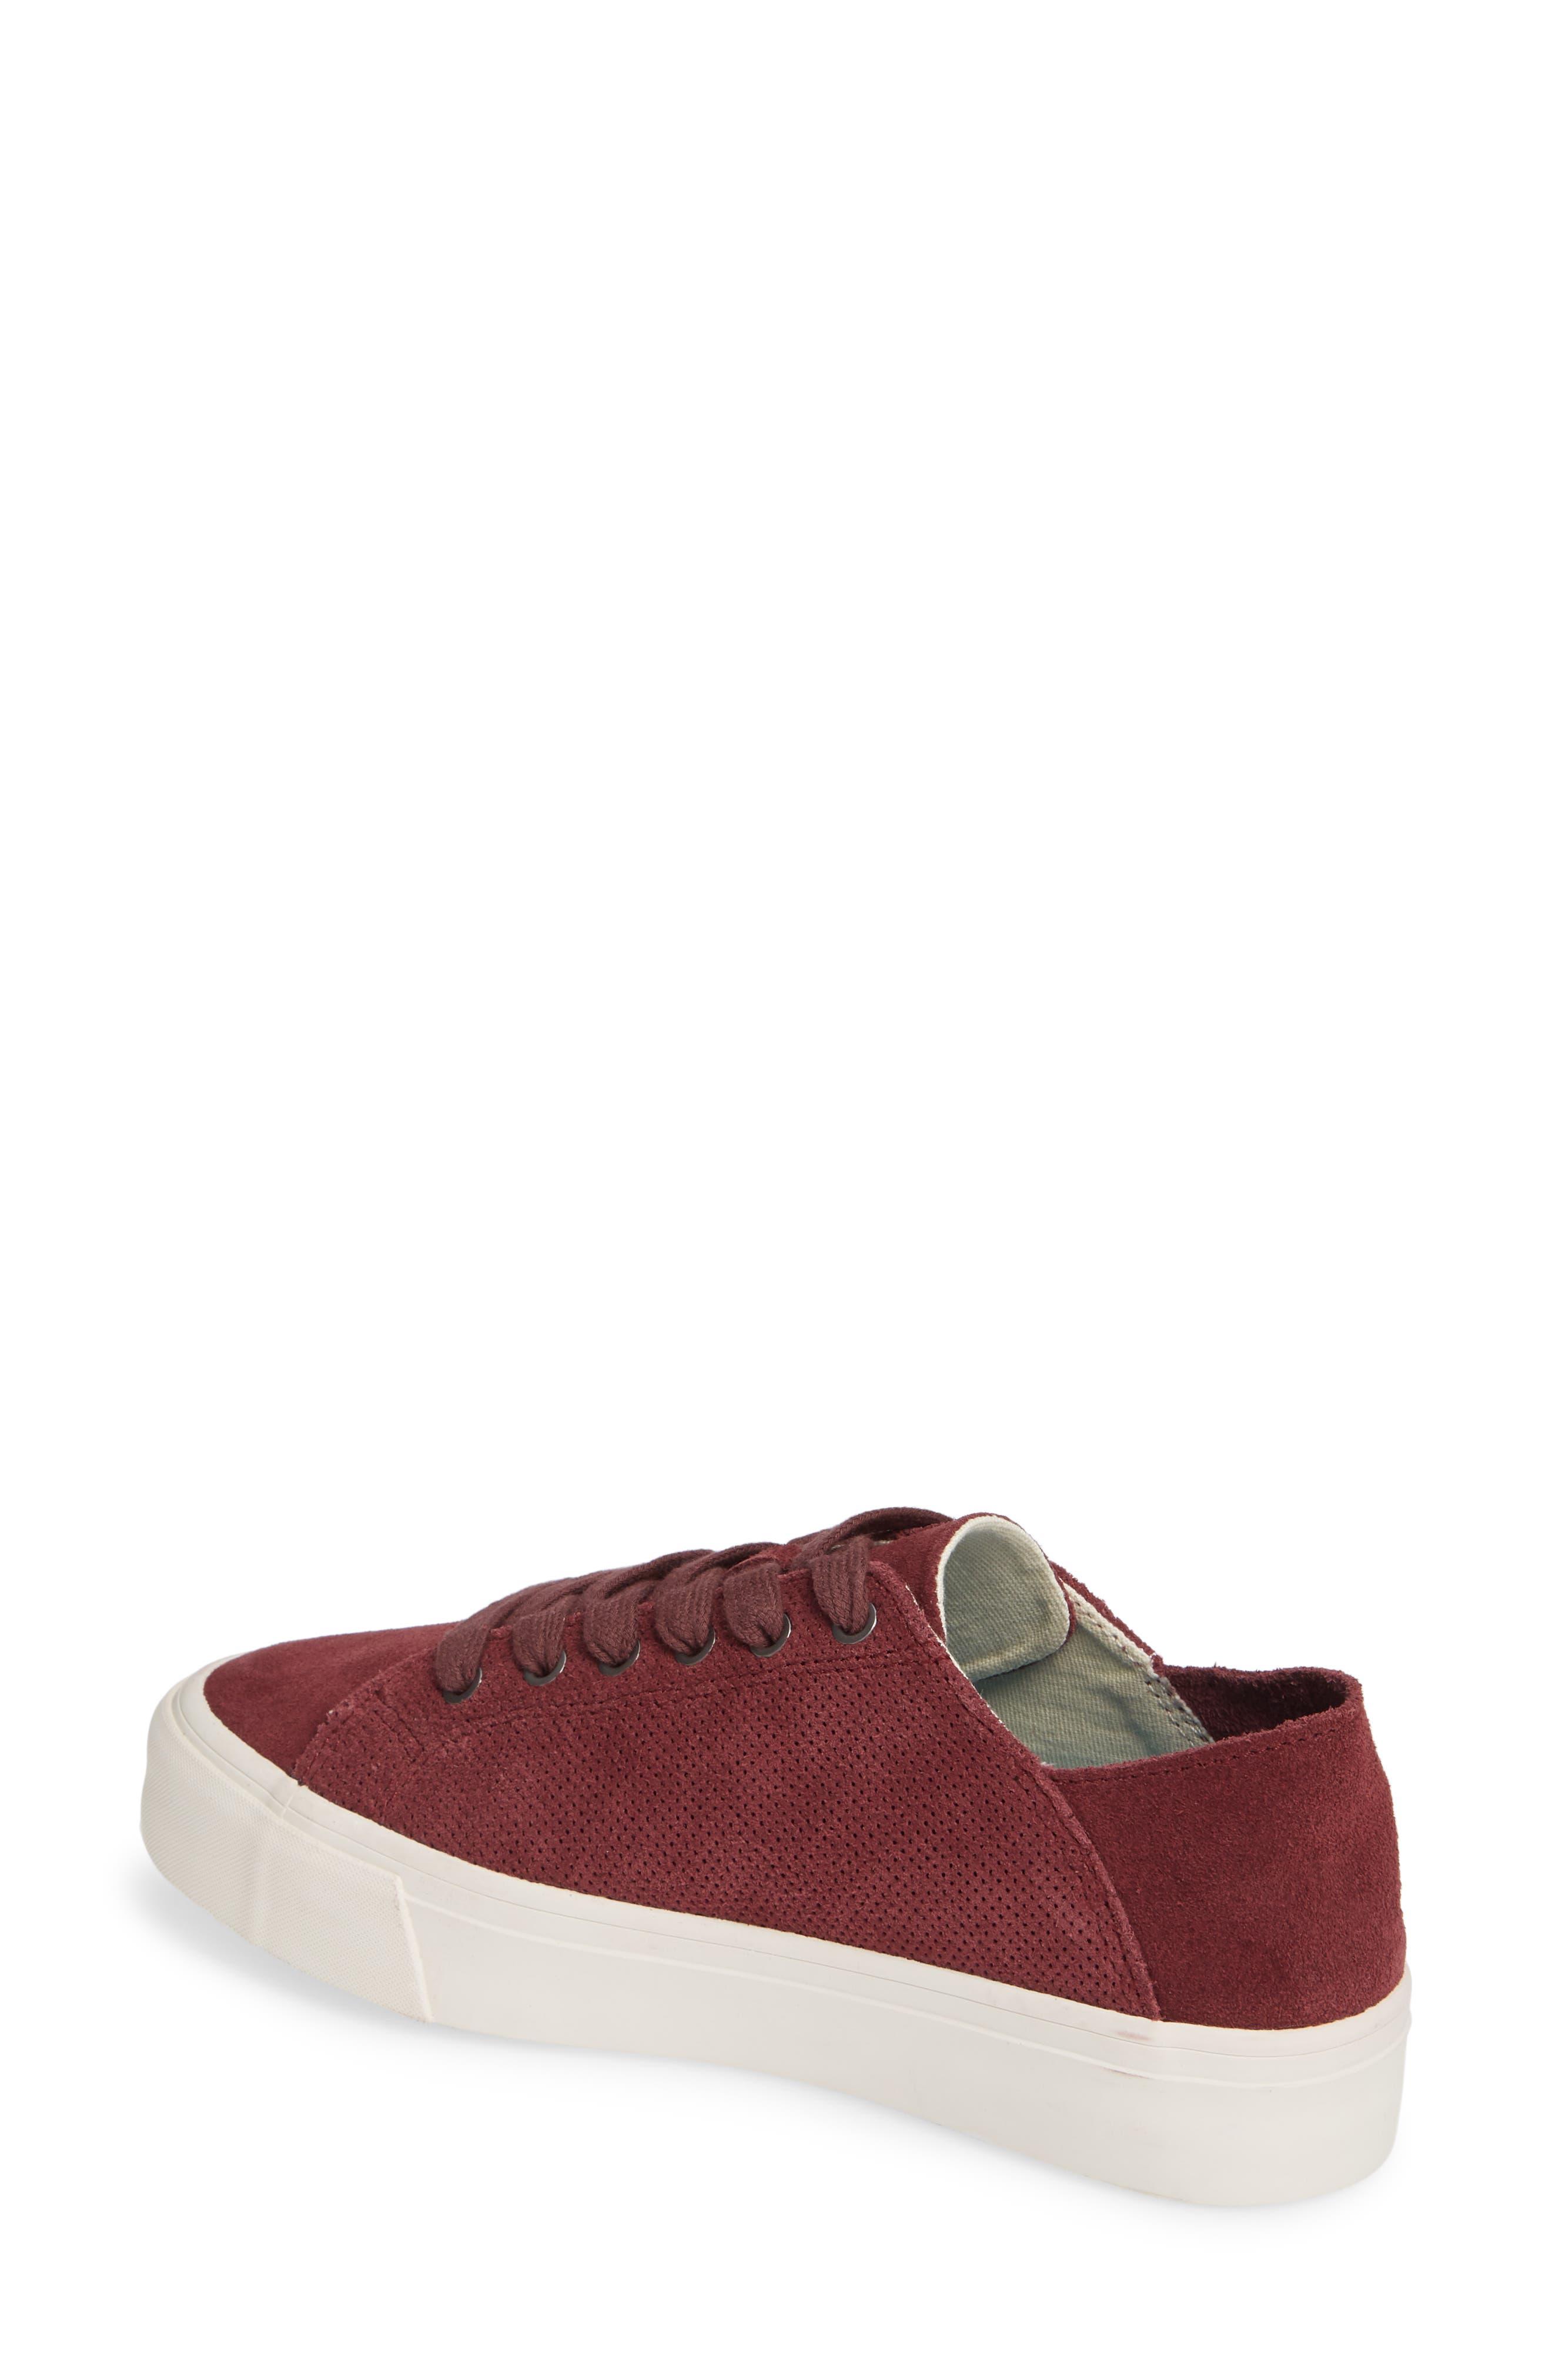 Sausalito Sneaker,                             Alternate thumbnail 2, color,                             WINE